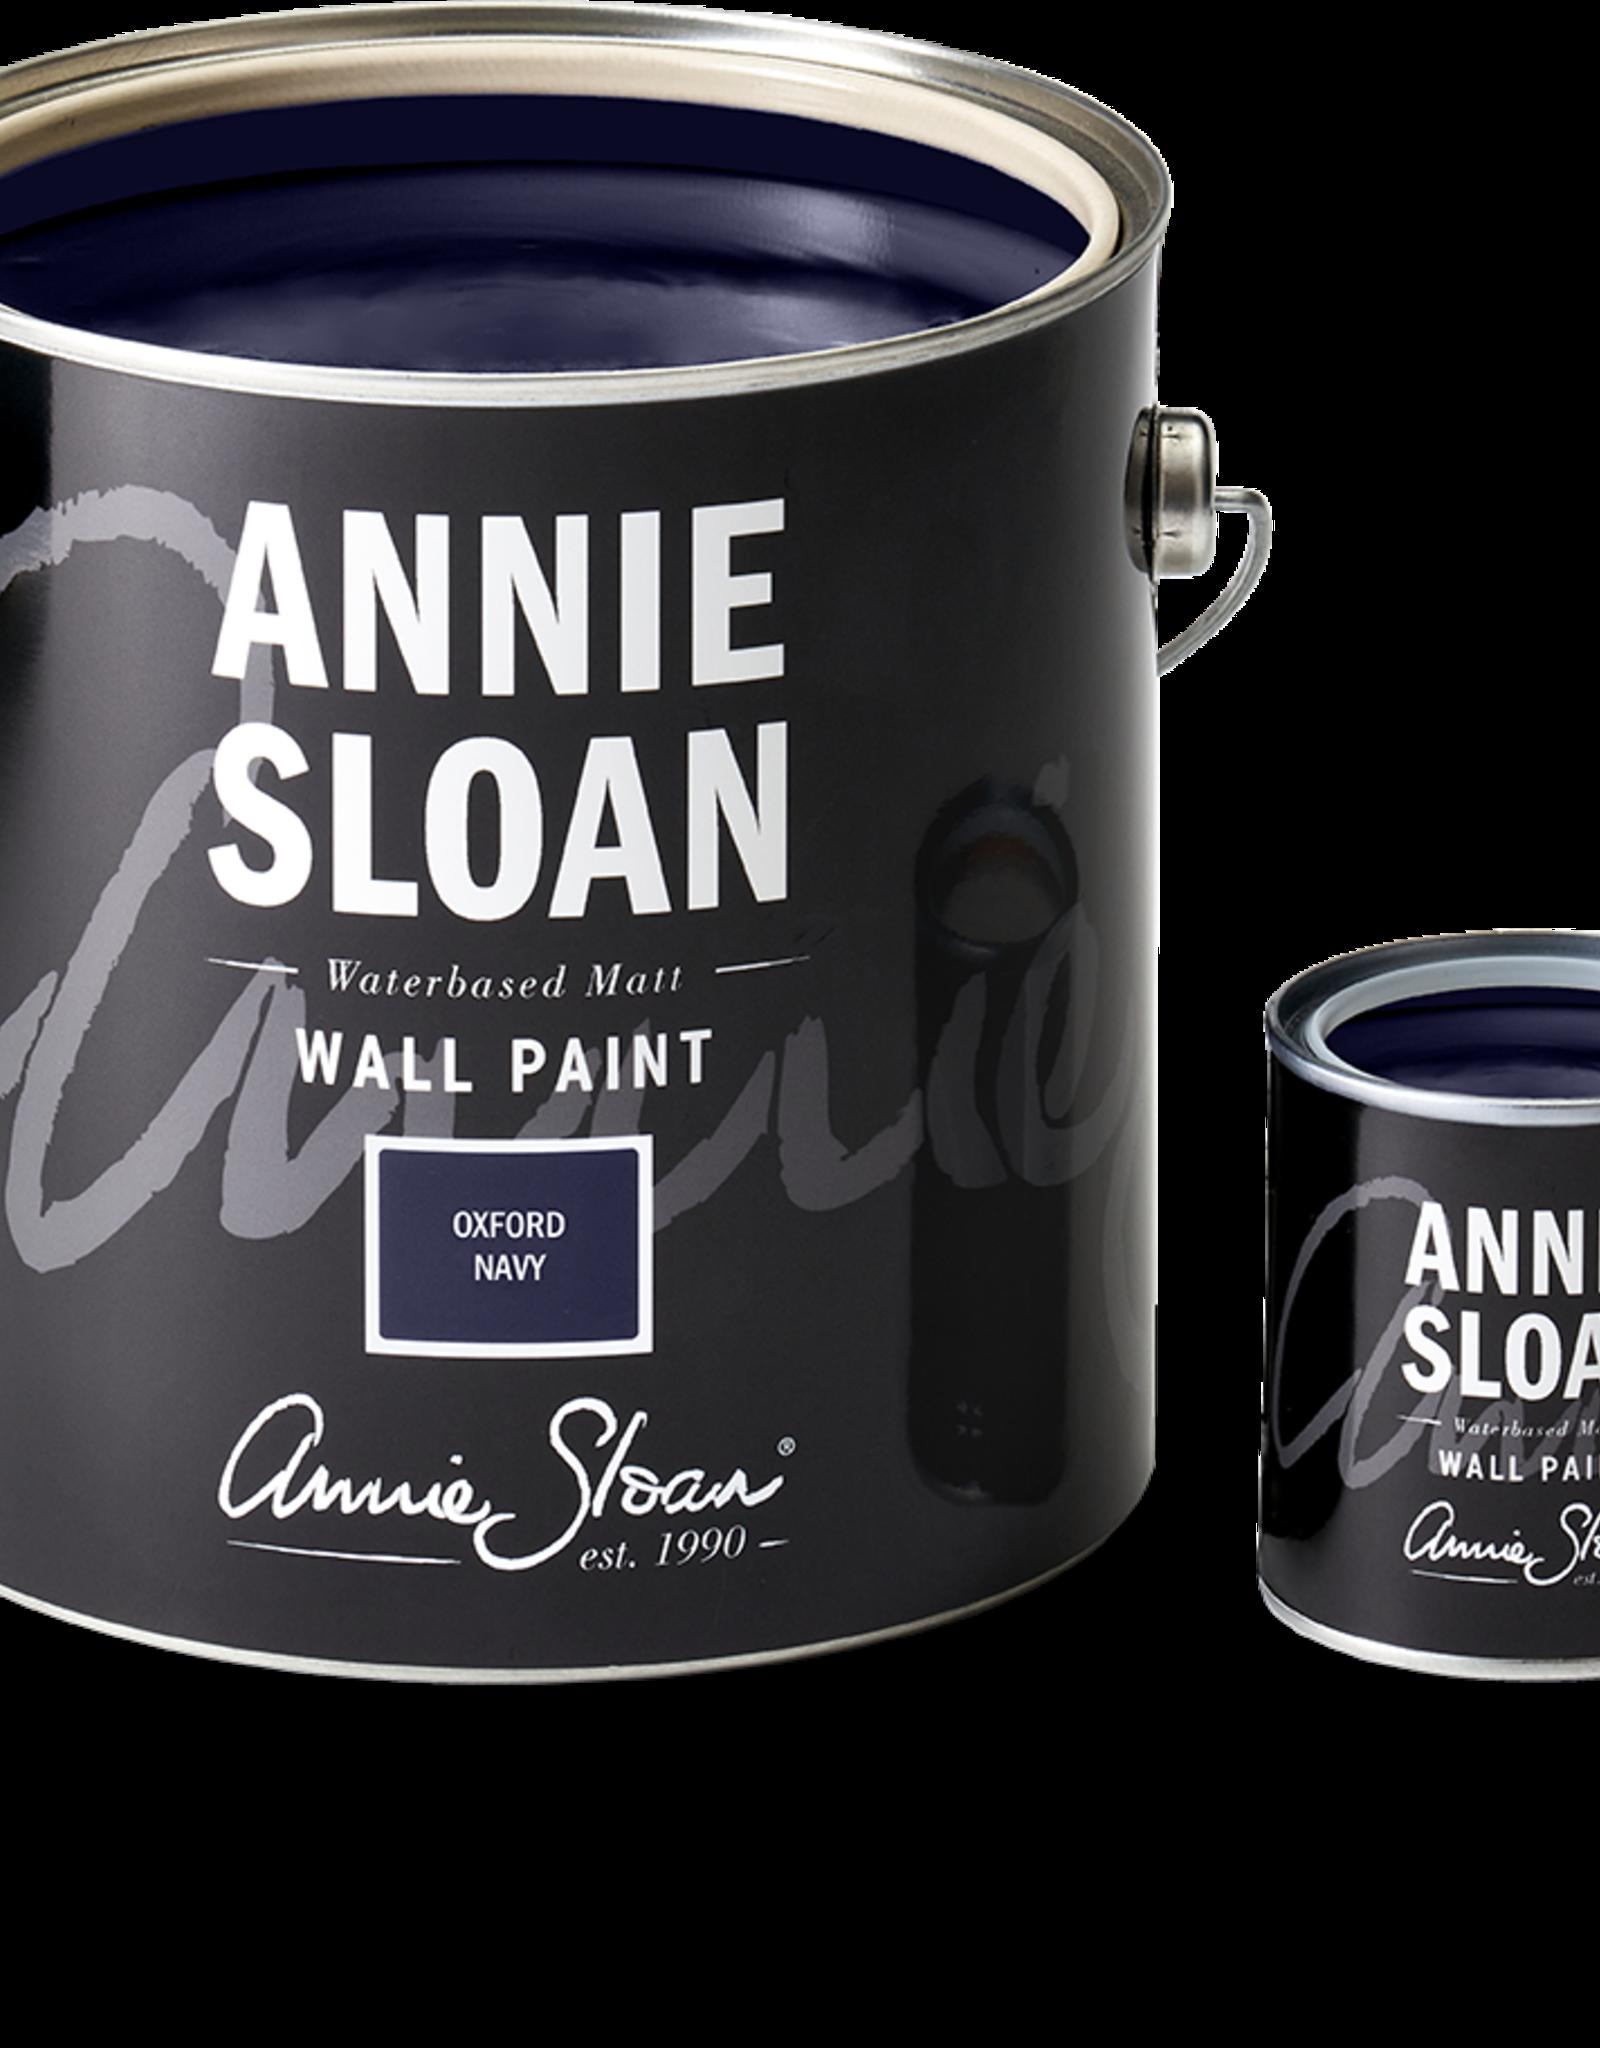 Annie Sloan Krijtverf Annie Sloan, New Wall Paint 2,5 Liter, Oxford Navy